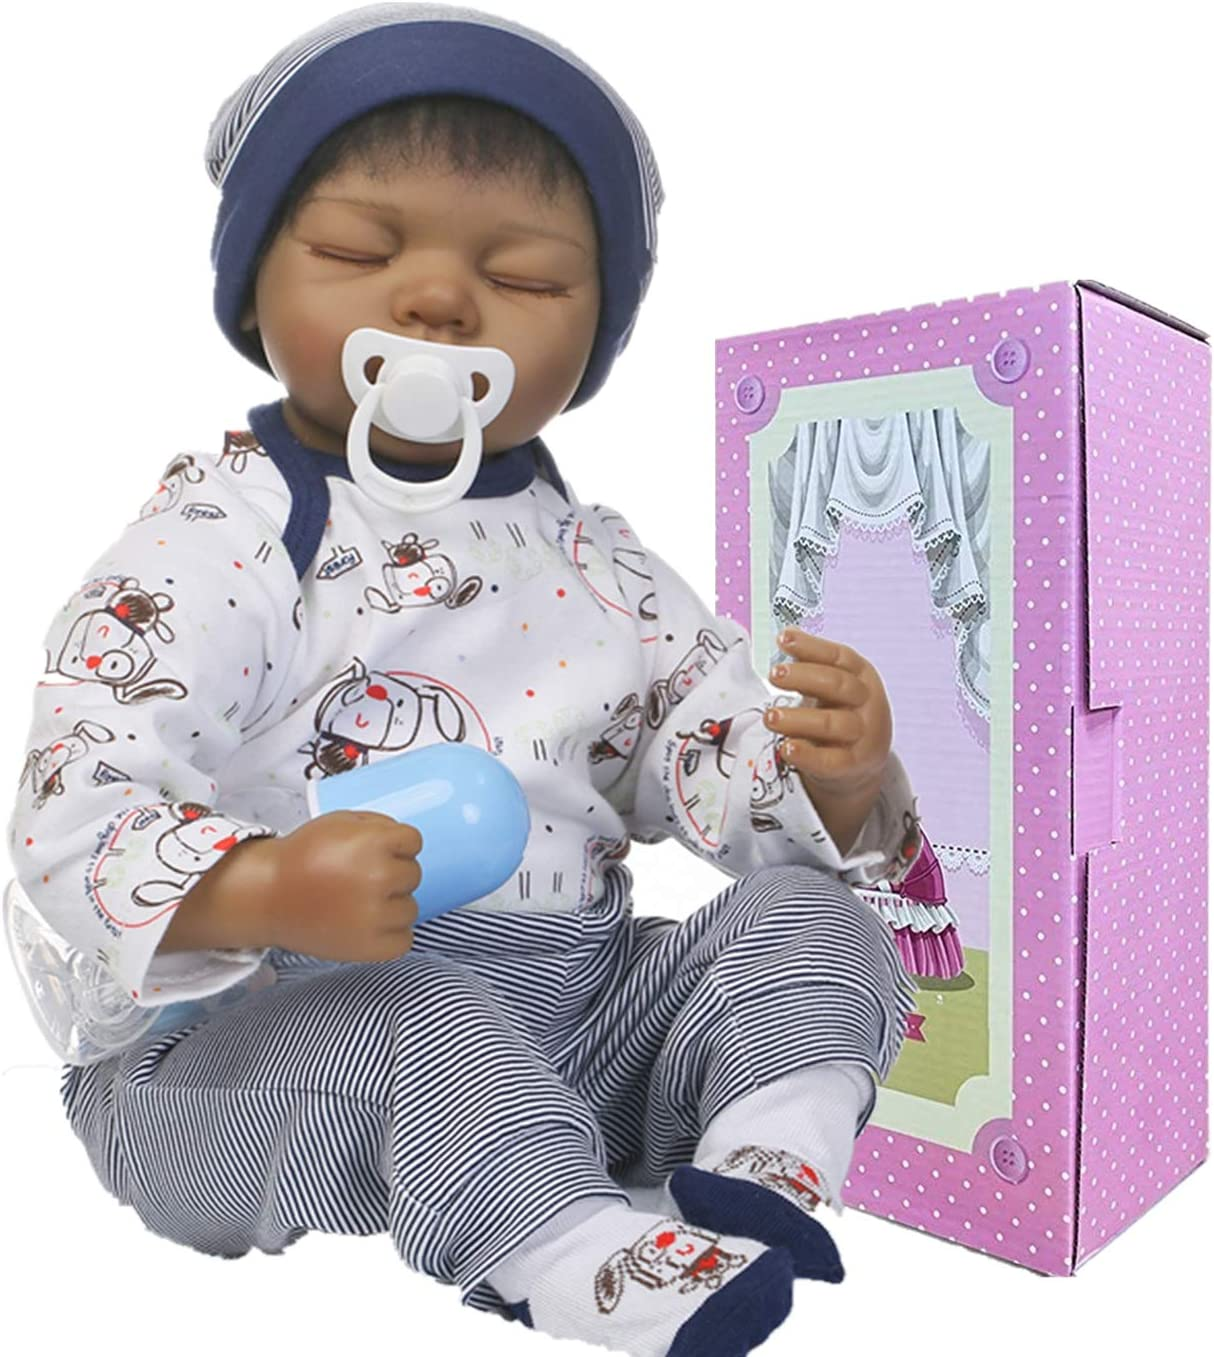 NPKTOYS African American Reborn Baby Max 52% OFF Soft Boy Sili Financial sales sale Doll Sleeping